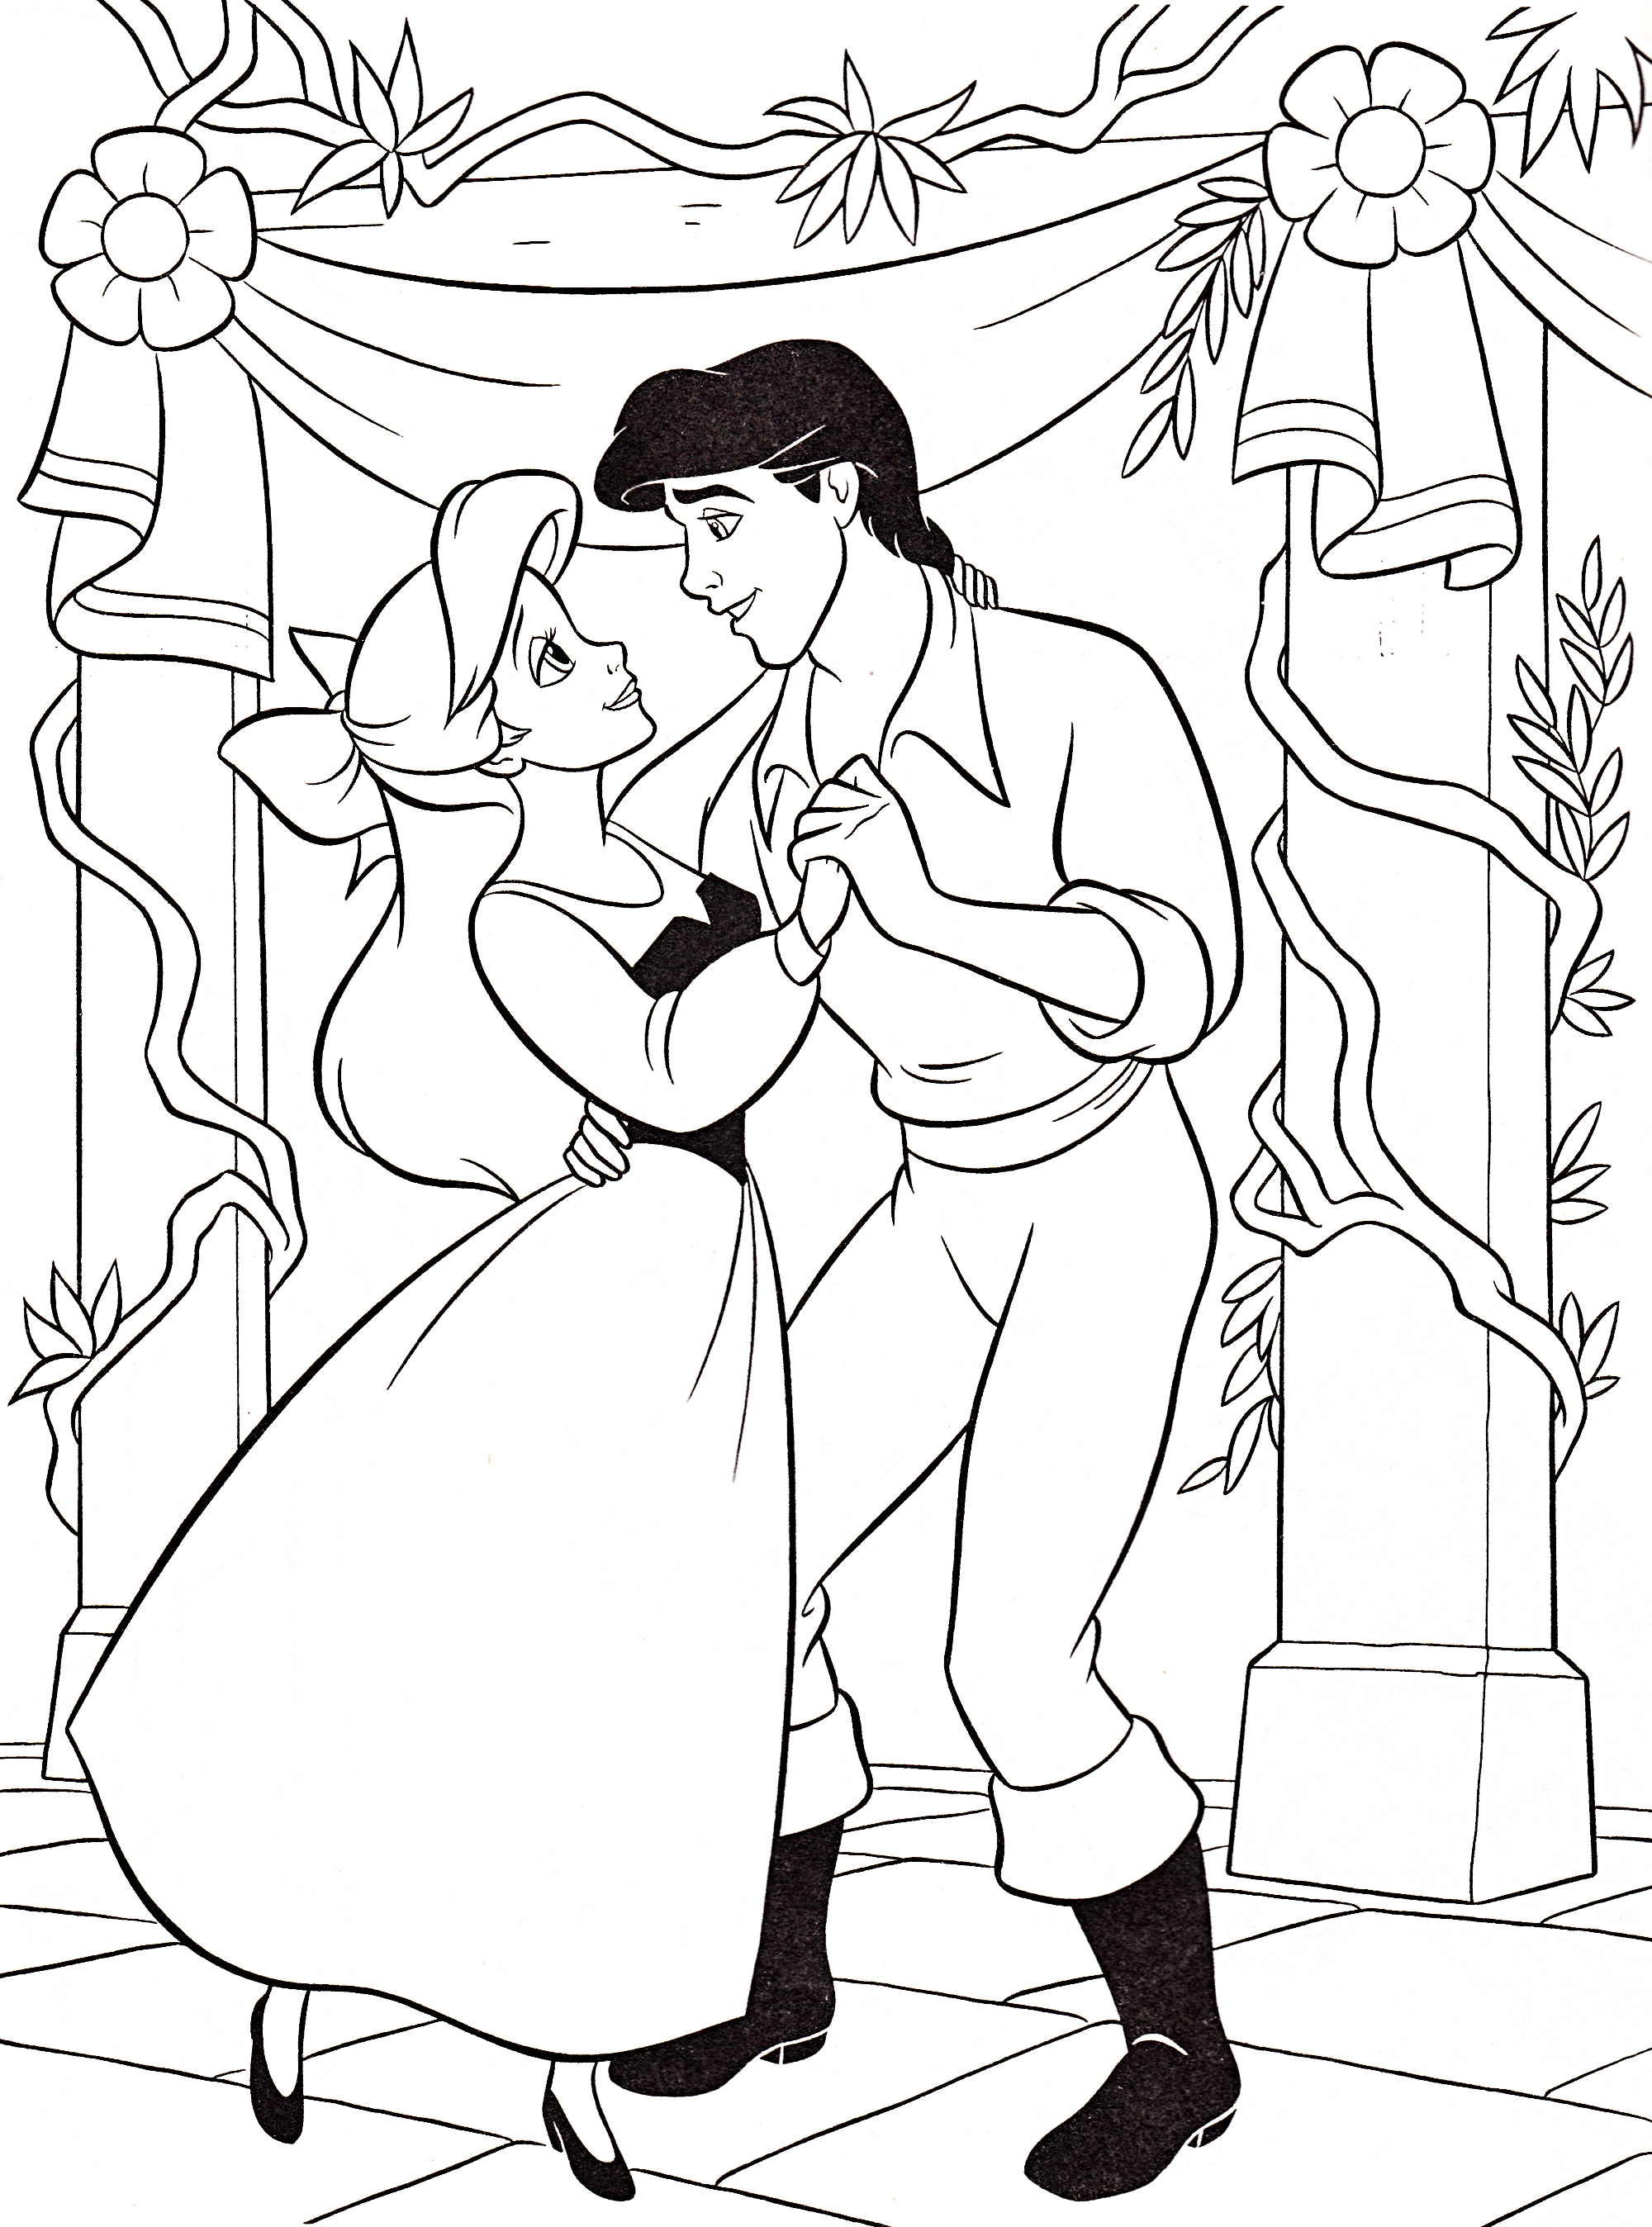 Coloriage disney princesse ariel et prince eric imprimer - Coloriage princesse ariel ...